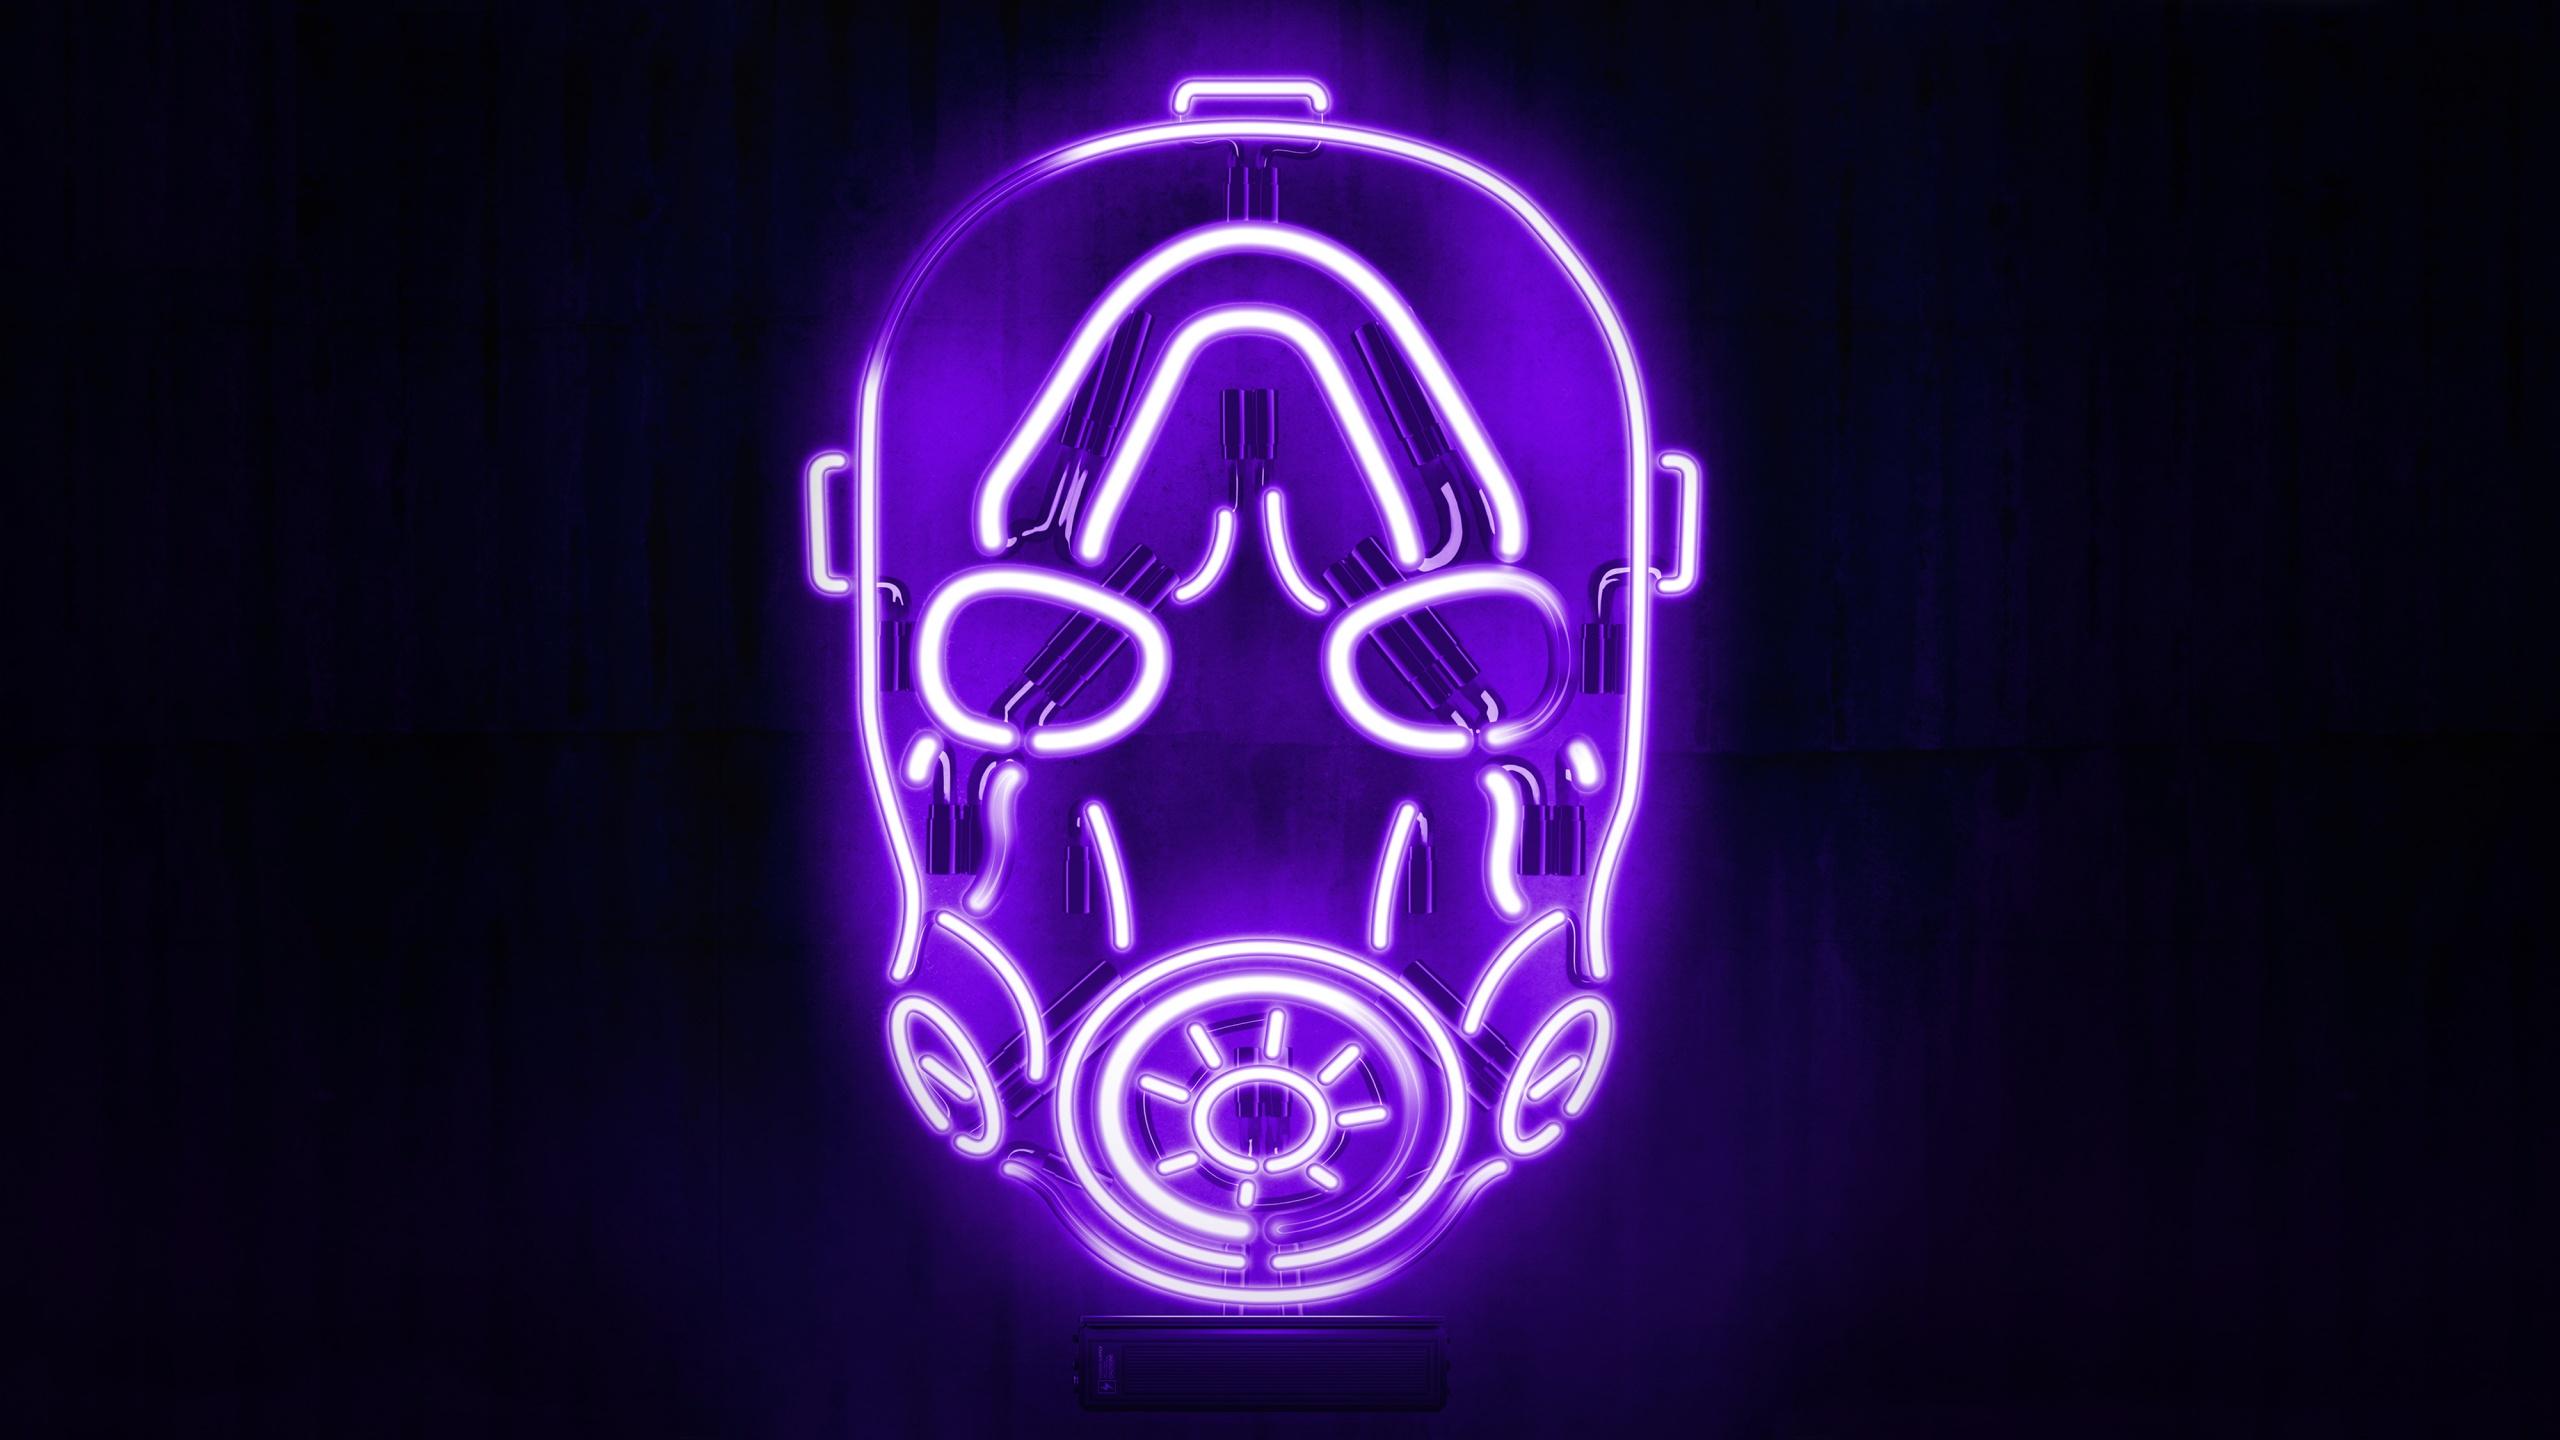 Borderlands Psycho Mask 4k Wallpaper Neon Black Background Graphics Cgi 492